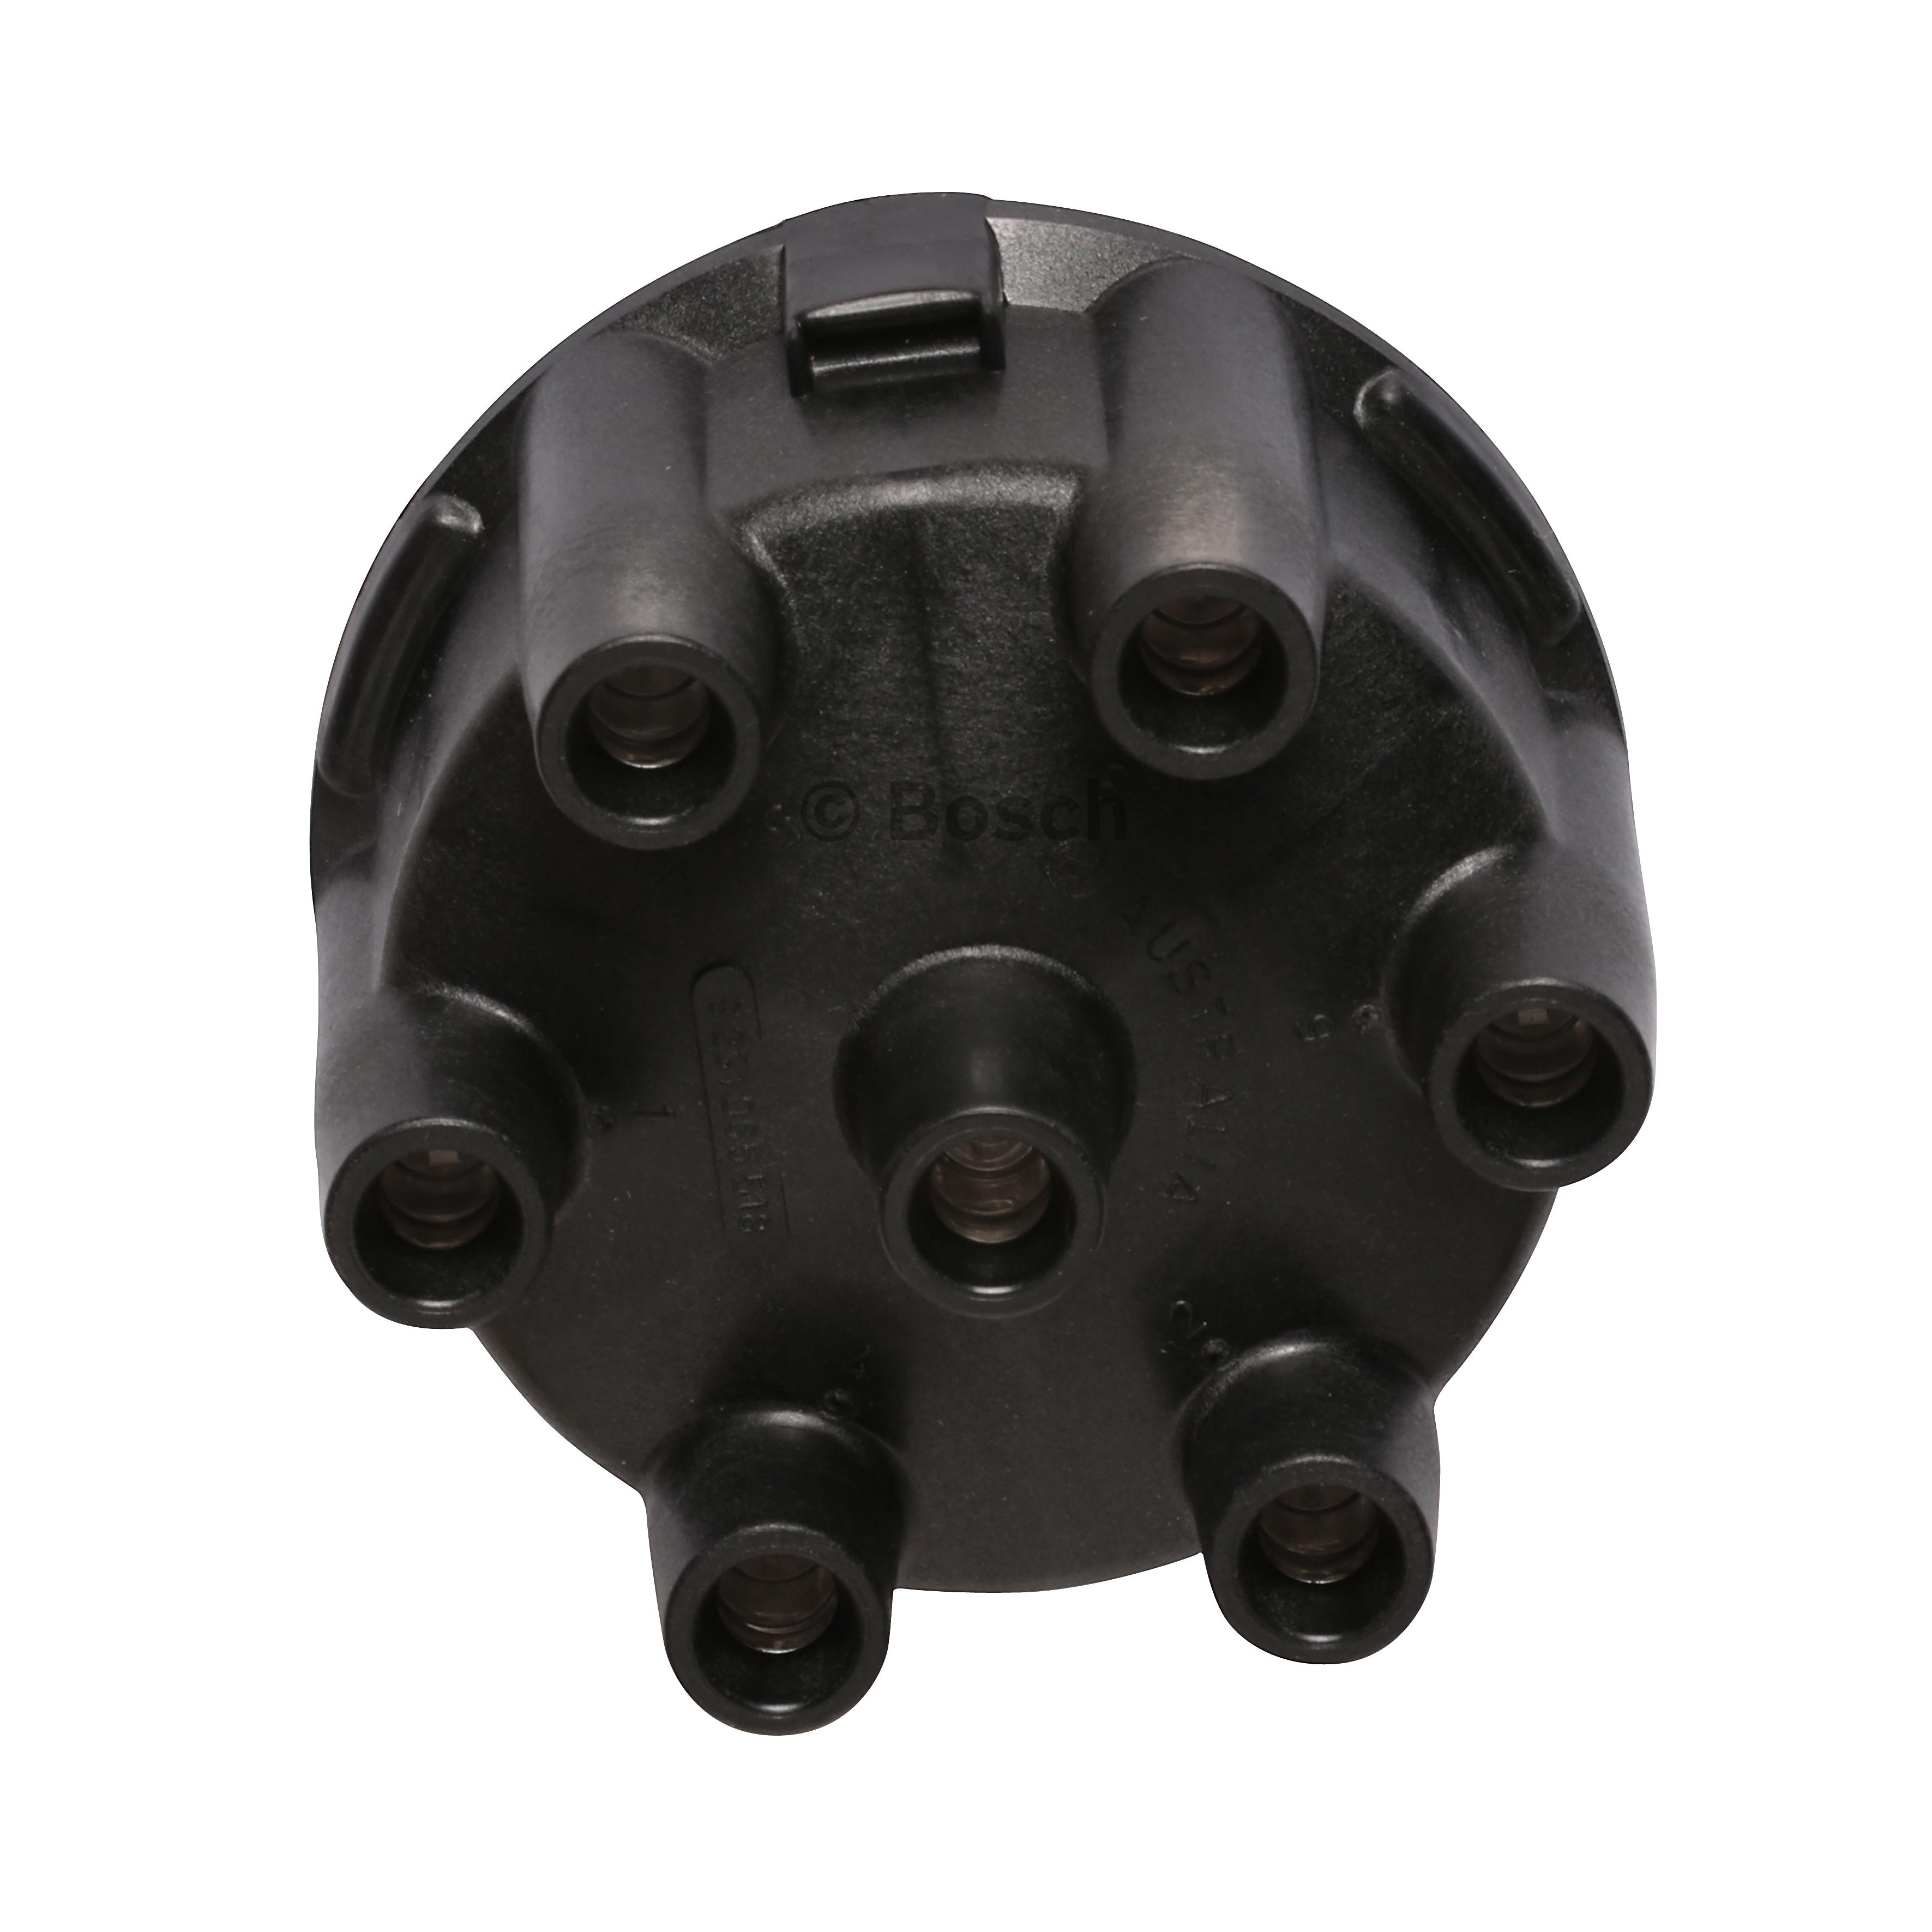 Fuel Tank Cap-Saddle Tank Fuel Cap Gates 31803